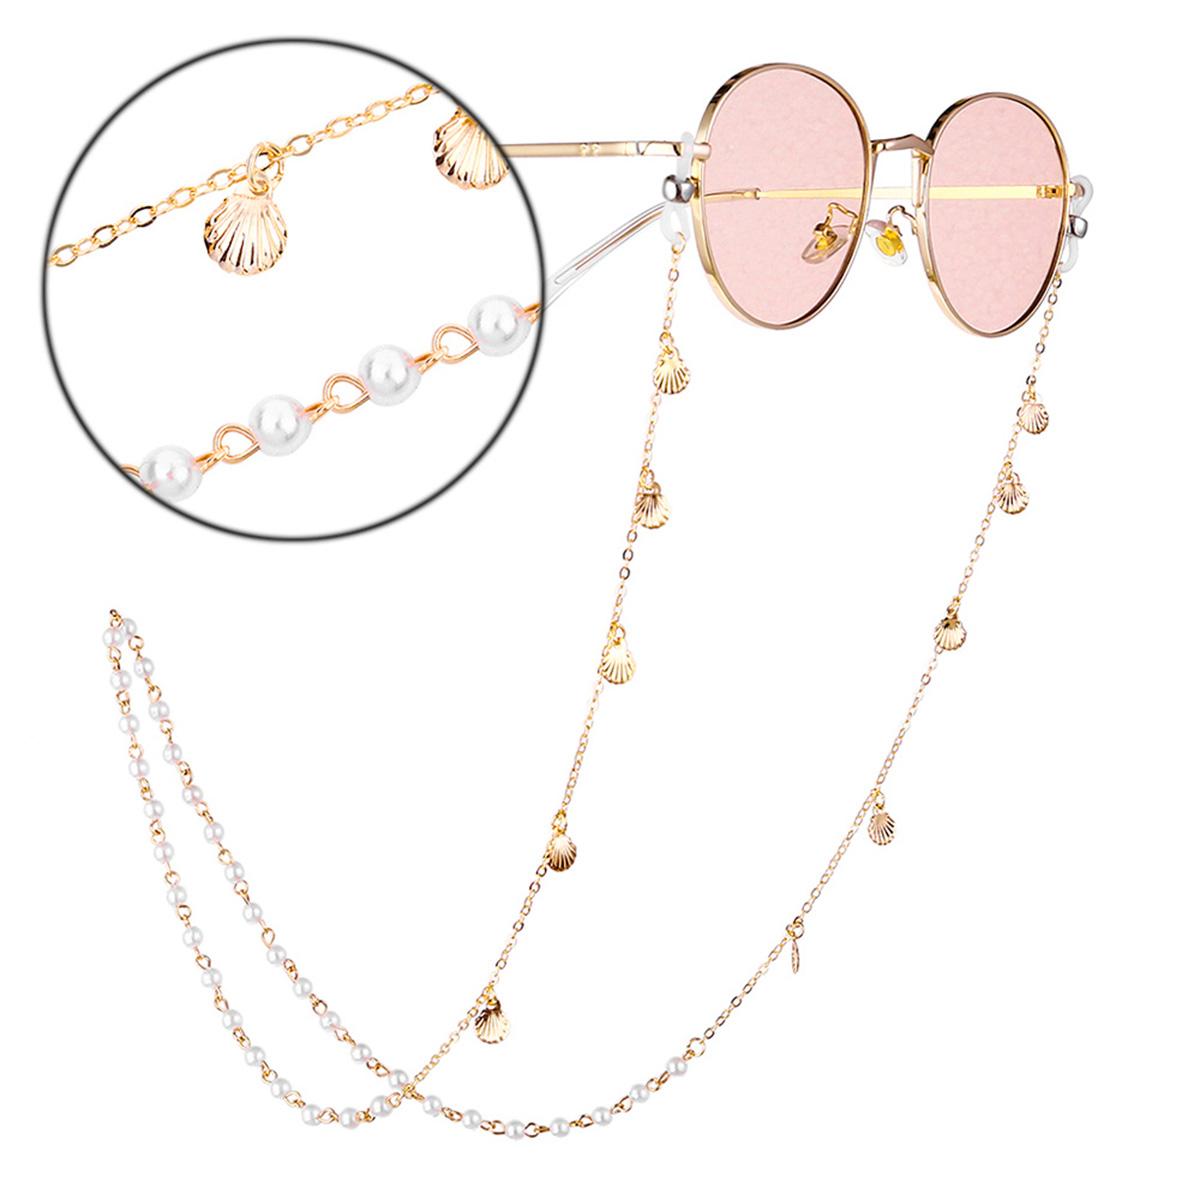 Chic Eyeglasses Chain Pearl Shell Decoration Sweet Style Eyeglasses Antiskid Chain Gold